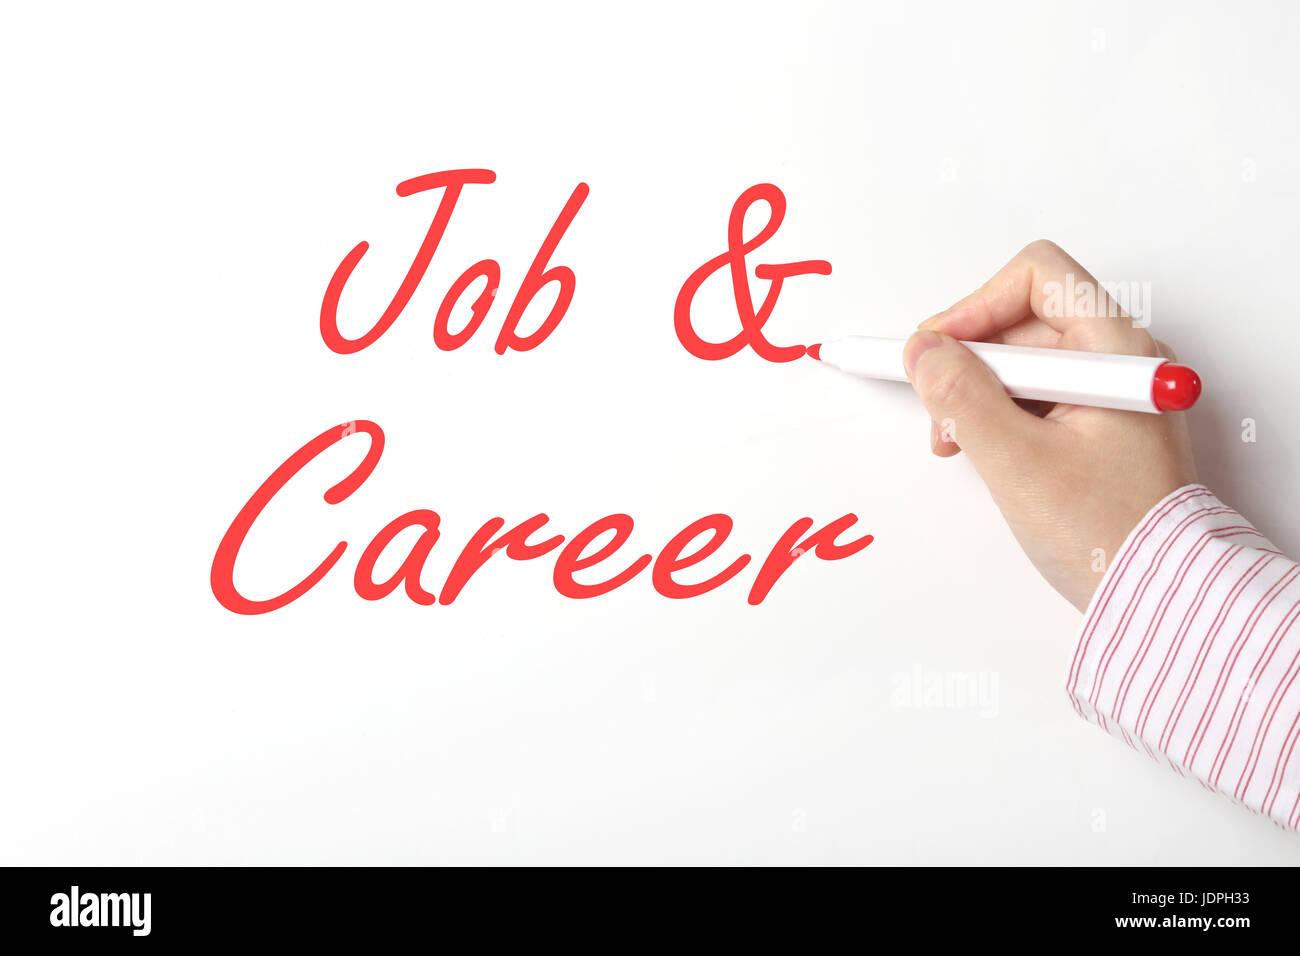 Business woman writing job and career word on whiteboard - Stock Image